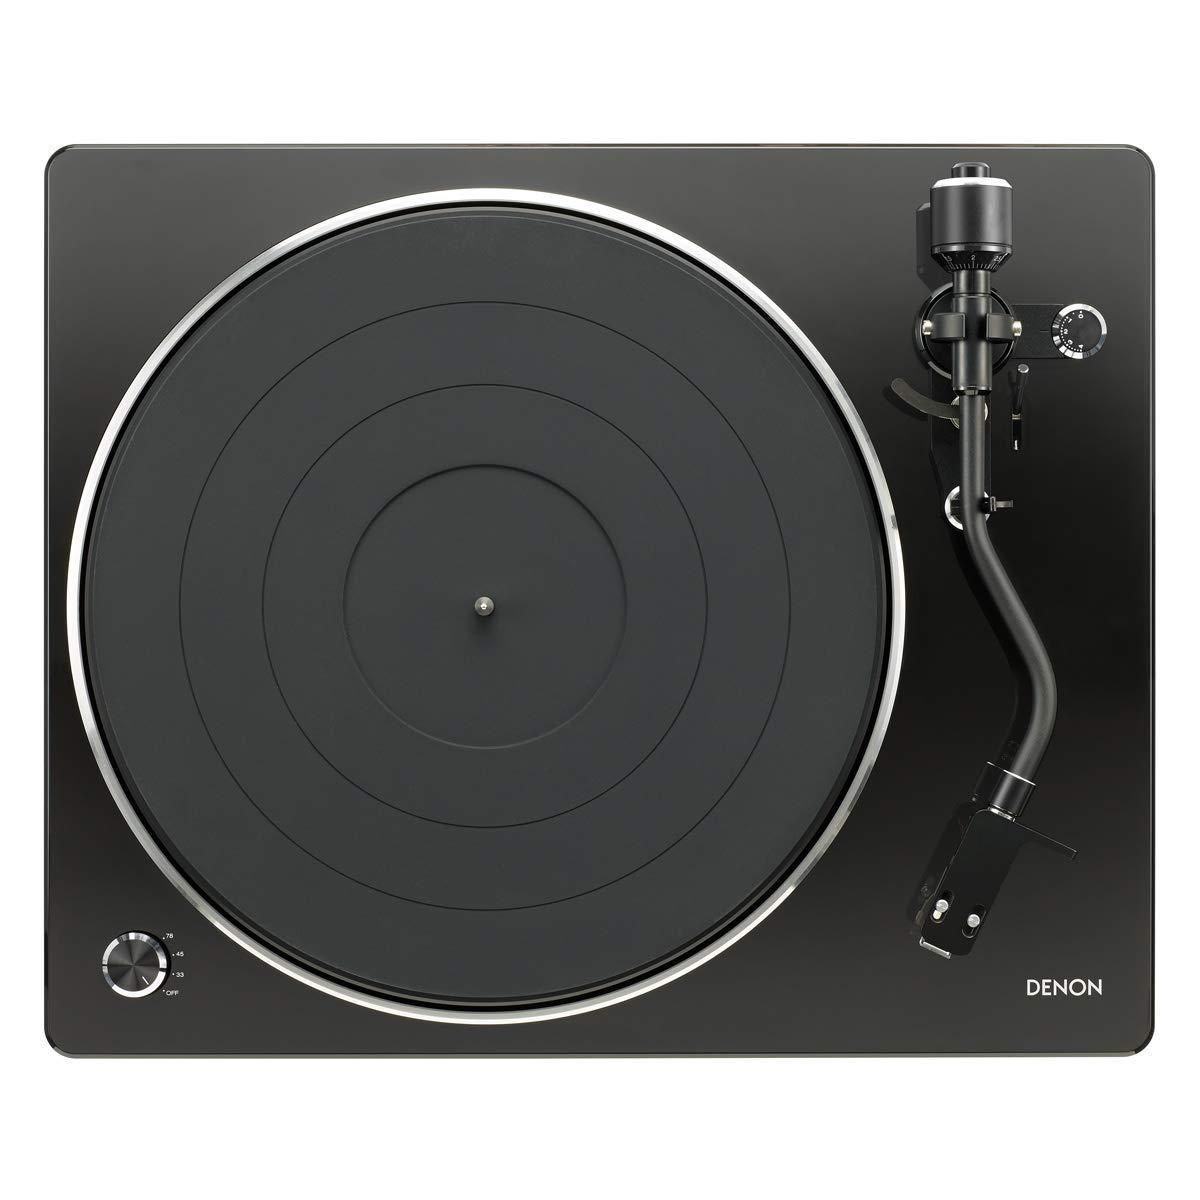 Amazon.com: Denon DP-400 - Tocadiscos de alta fidelidad ...